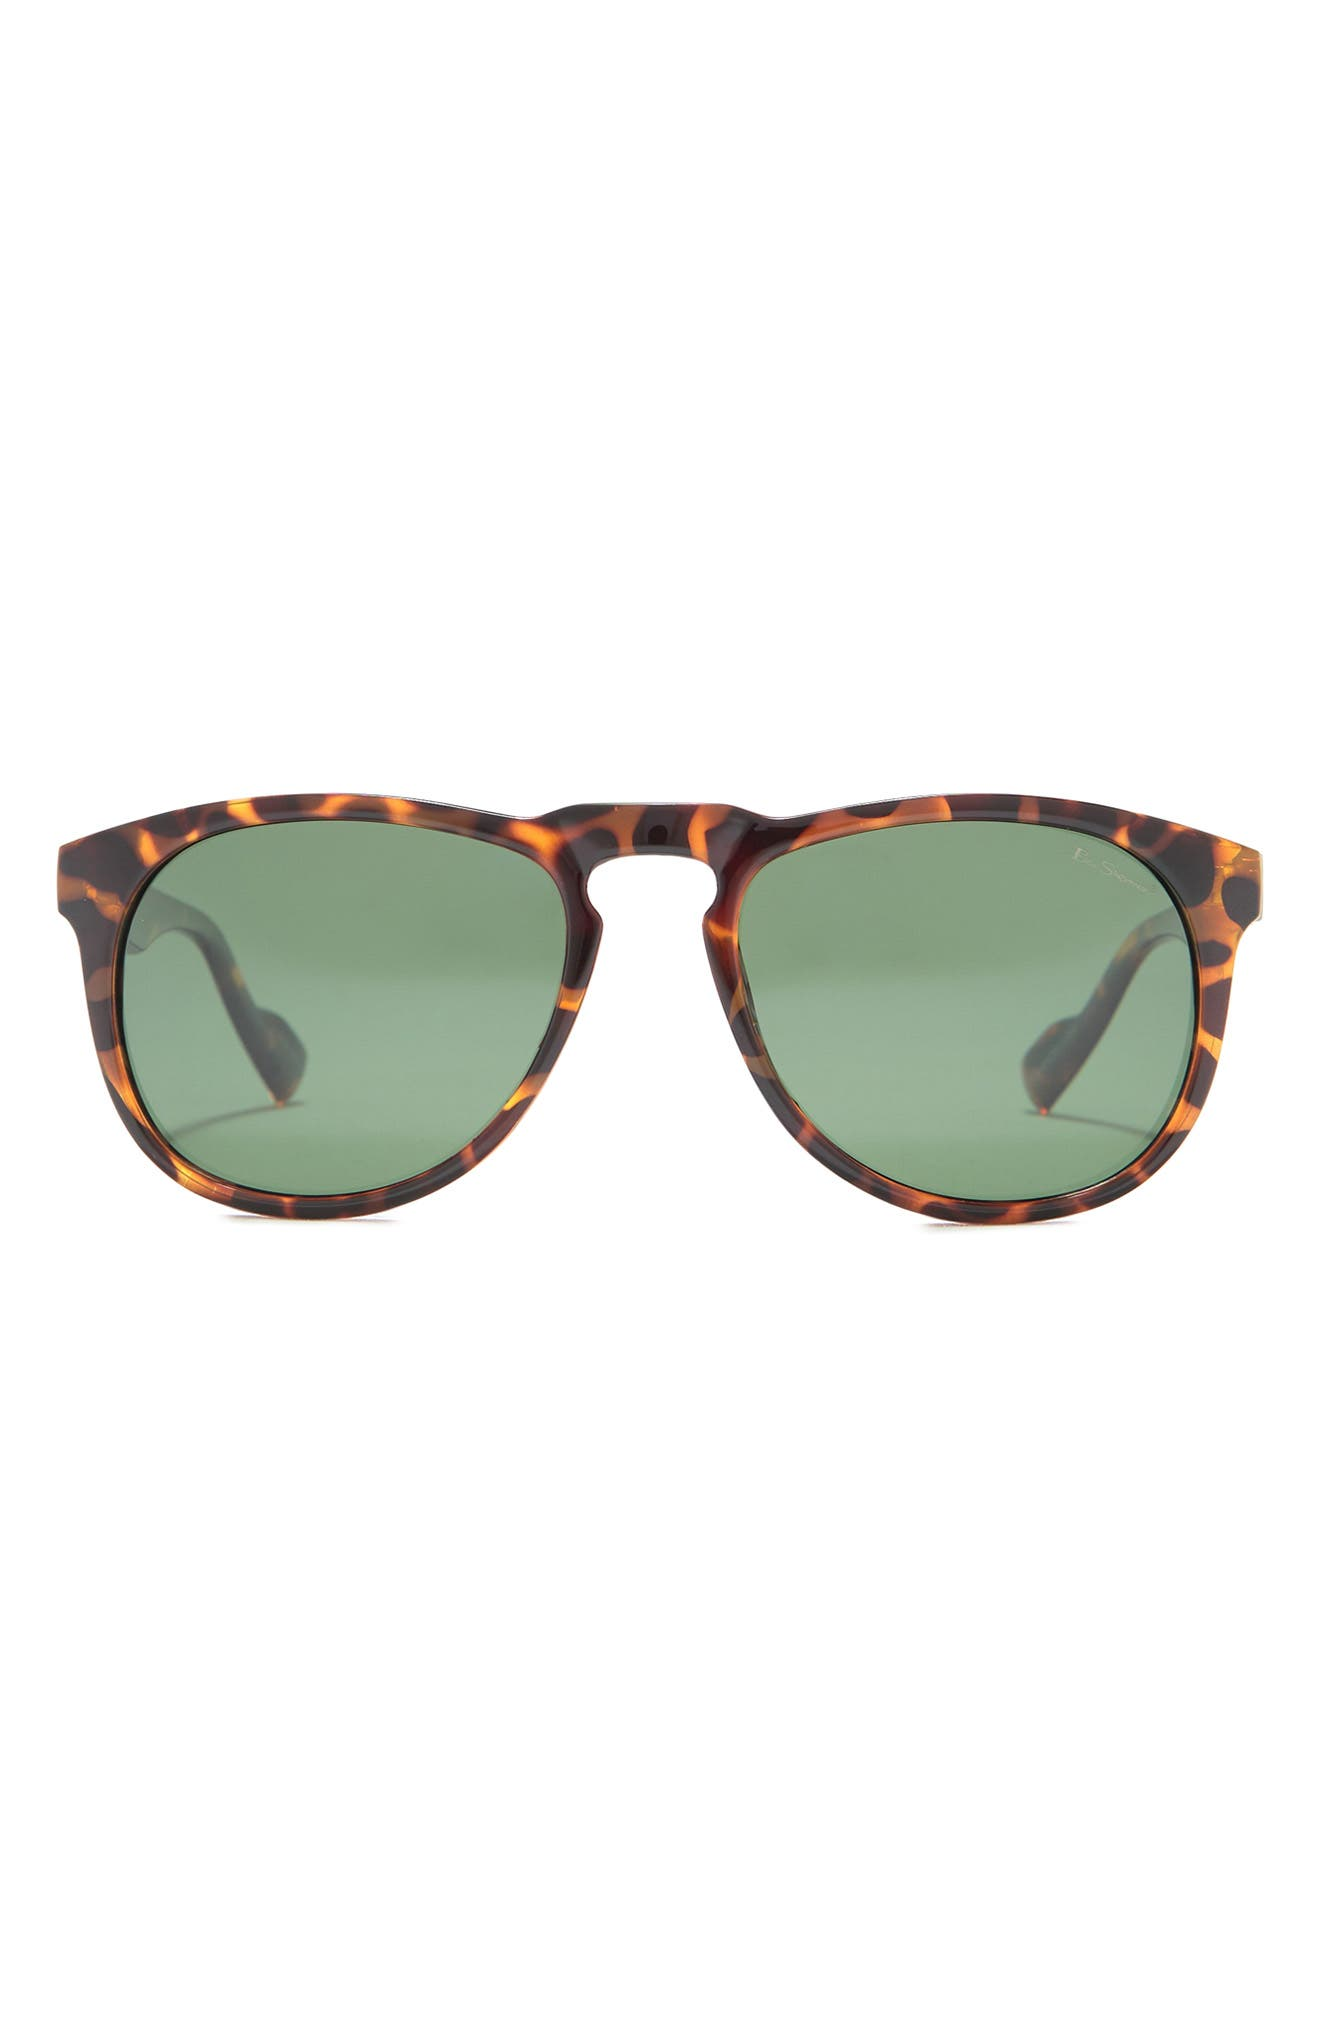 Image of Ben Sherman Charles 55mm Round Sunglasses